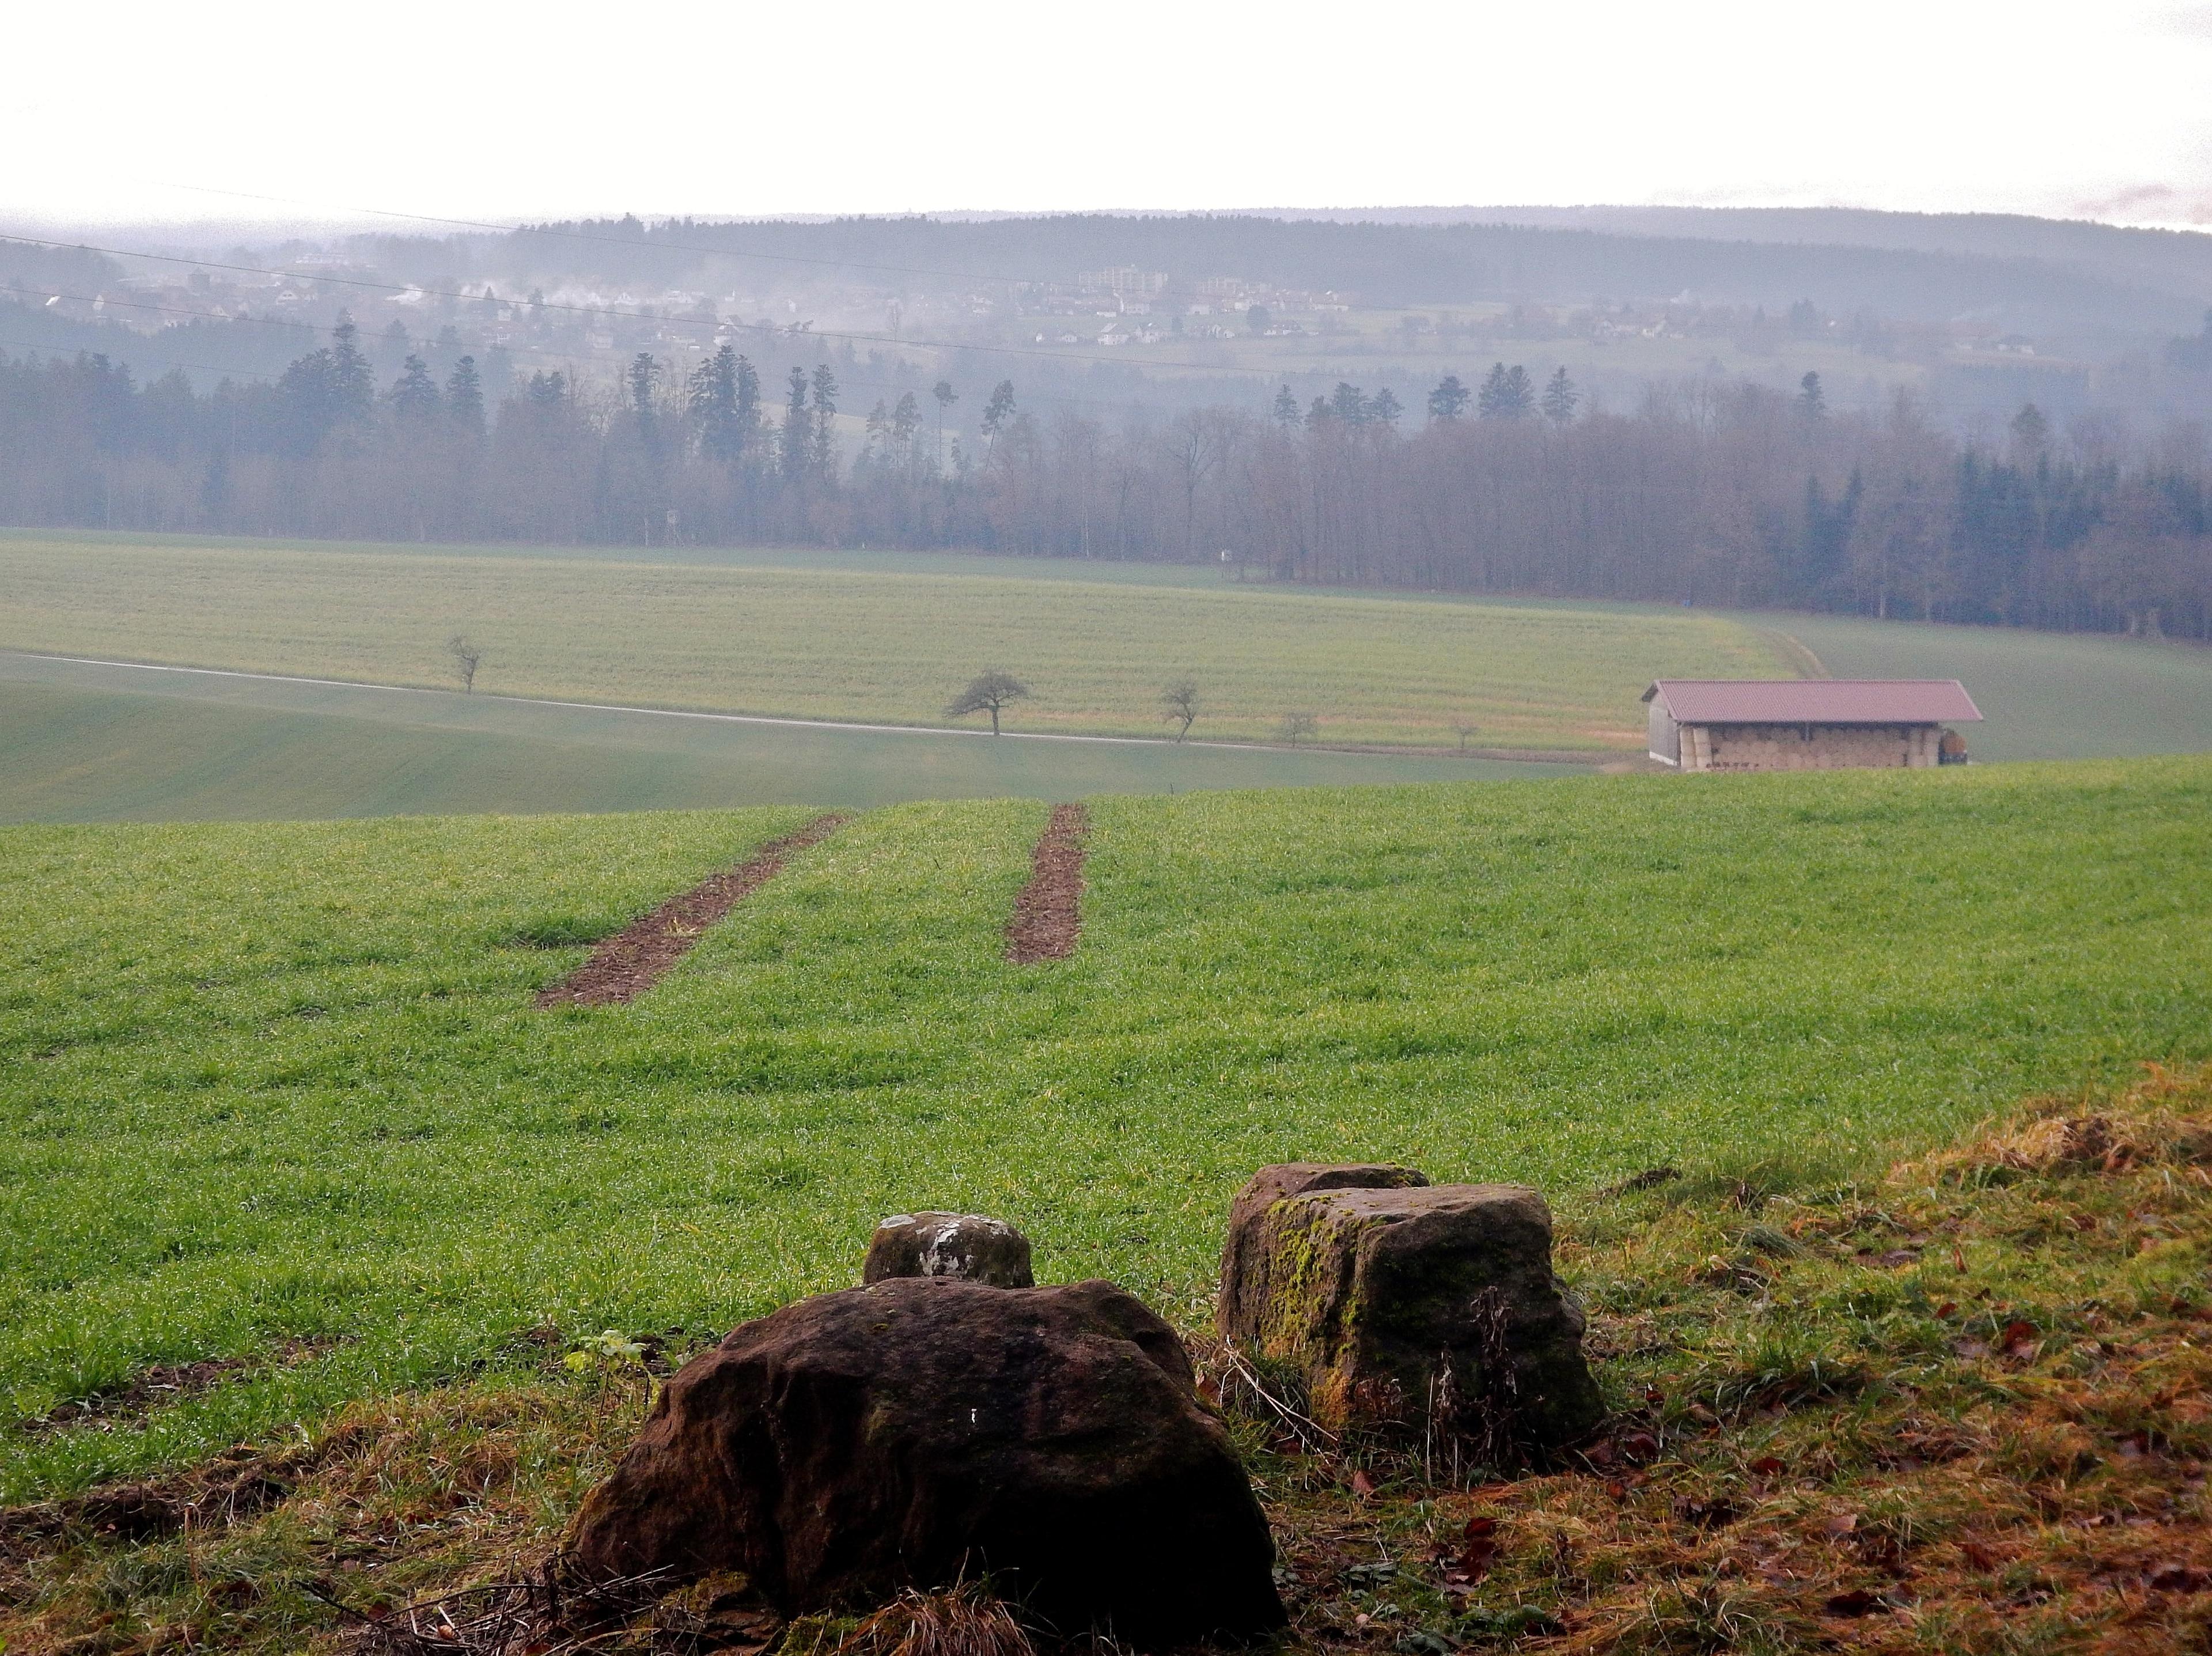 Calw, Baden-Württemberg, Germany